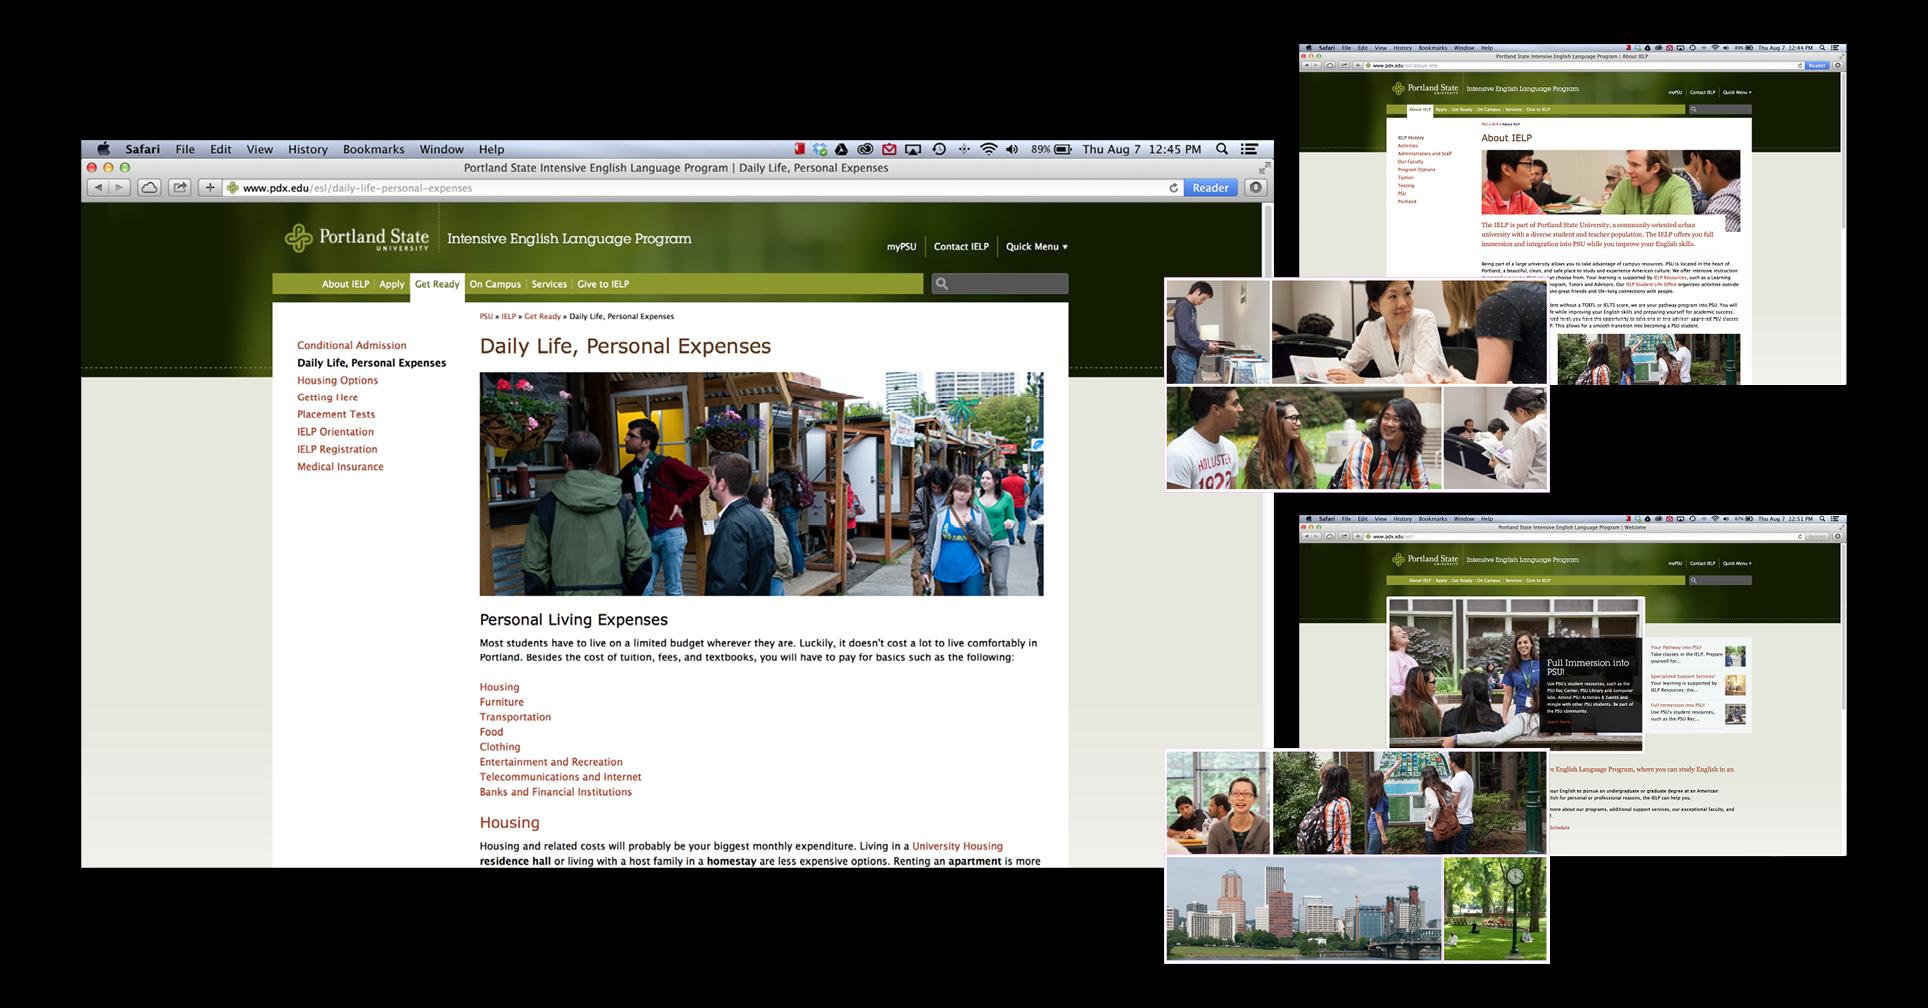 9-Portland State University-Web Imagery.rtna.png